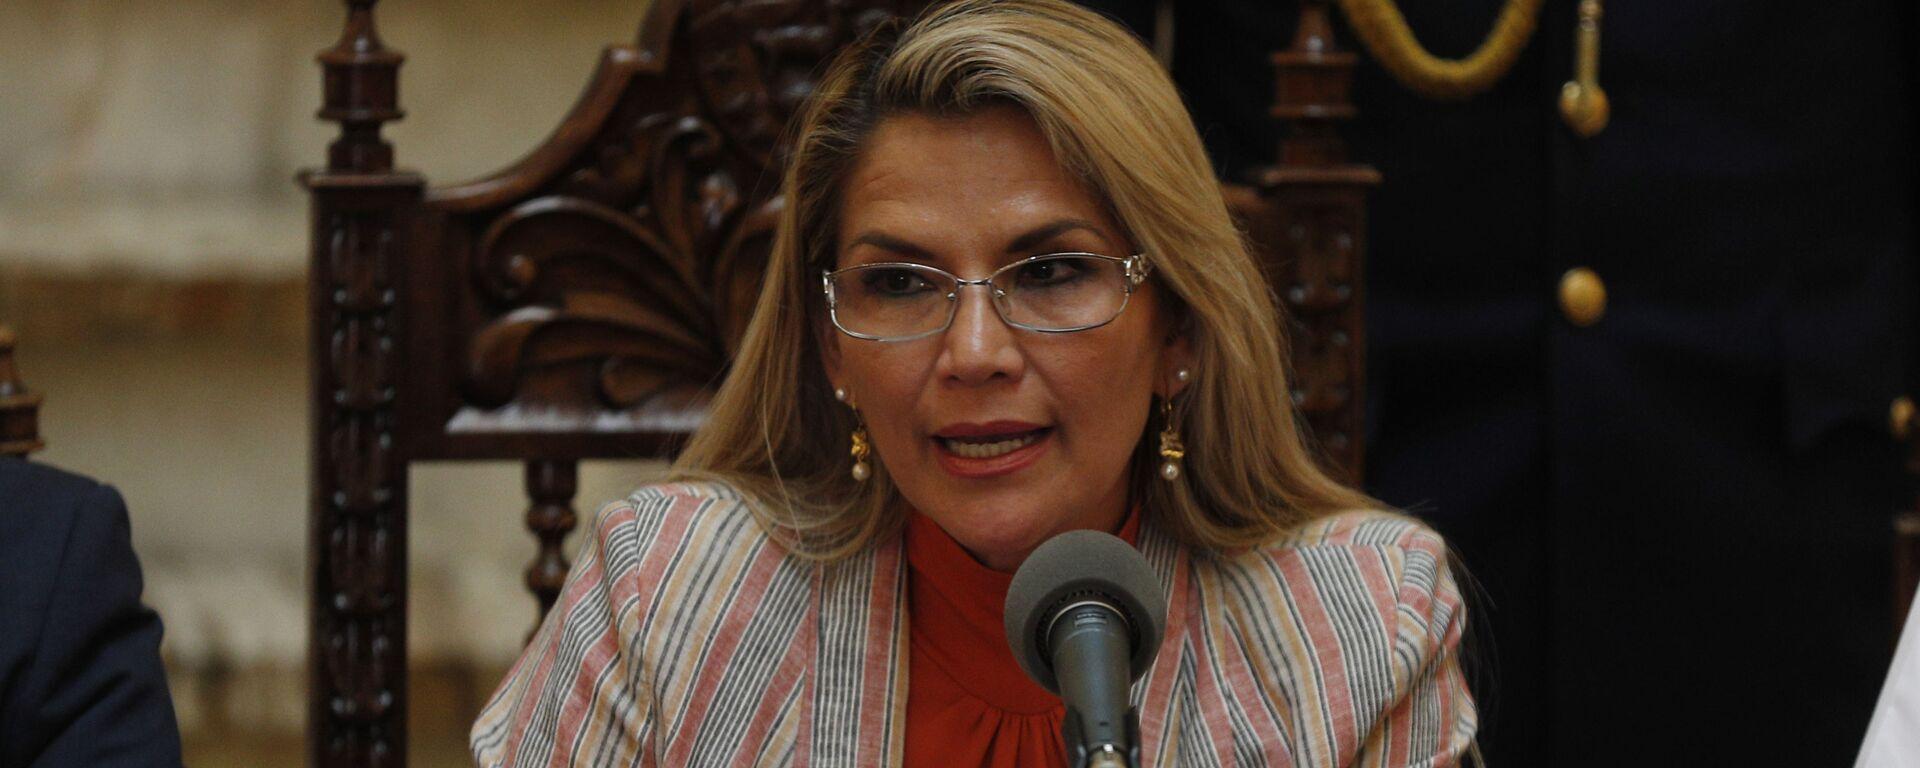 Jeanine Áñez, presidenta transitoria de Bolivia - Sputnik Mundo, 1920, 22.07.2021